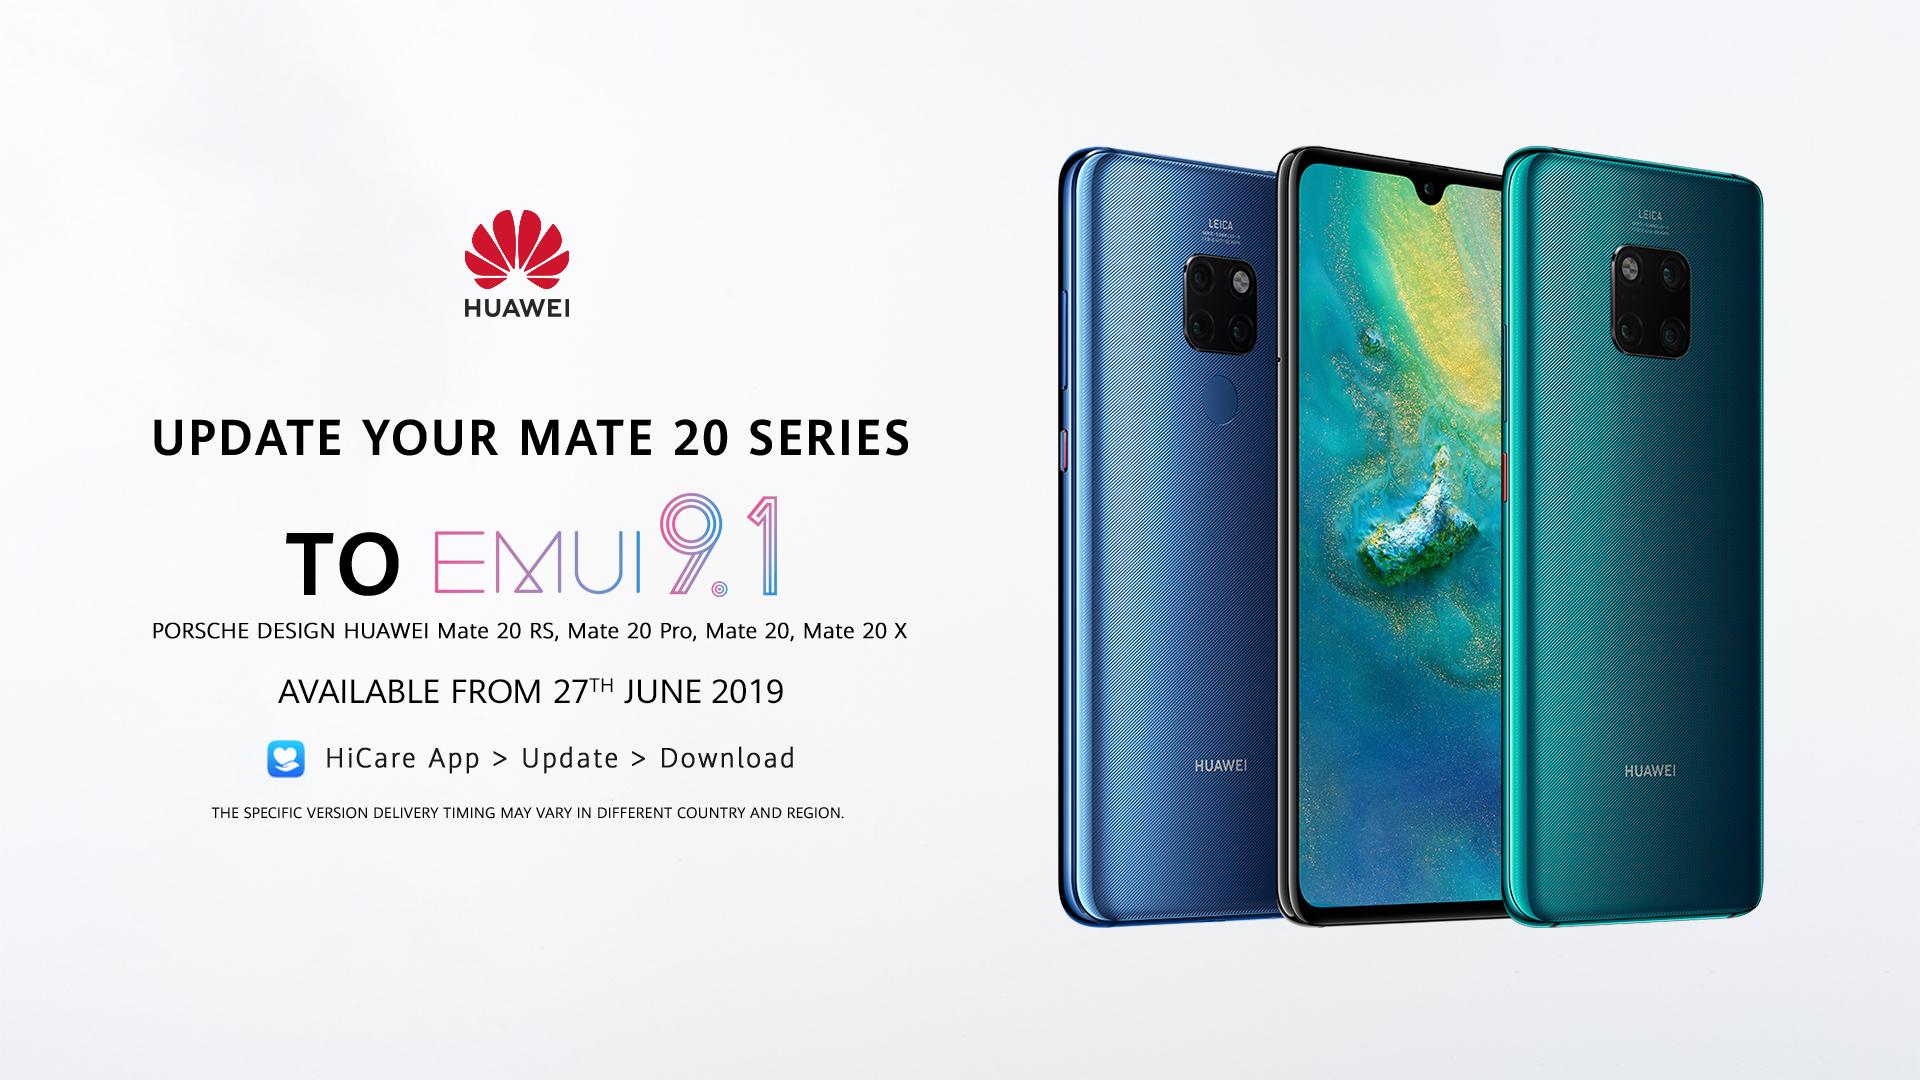 EMUI 9 1 Upgrade For Huawei Mate 20 Series Coming Soon